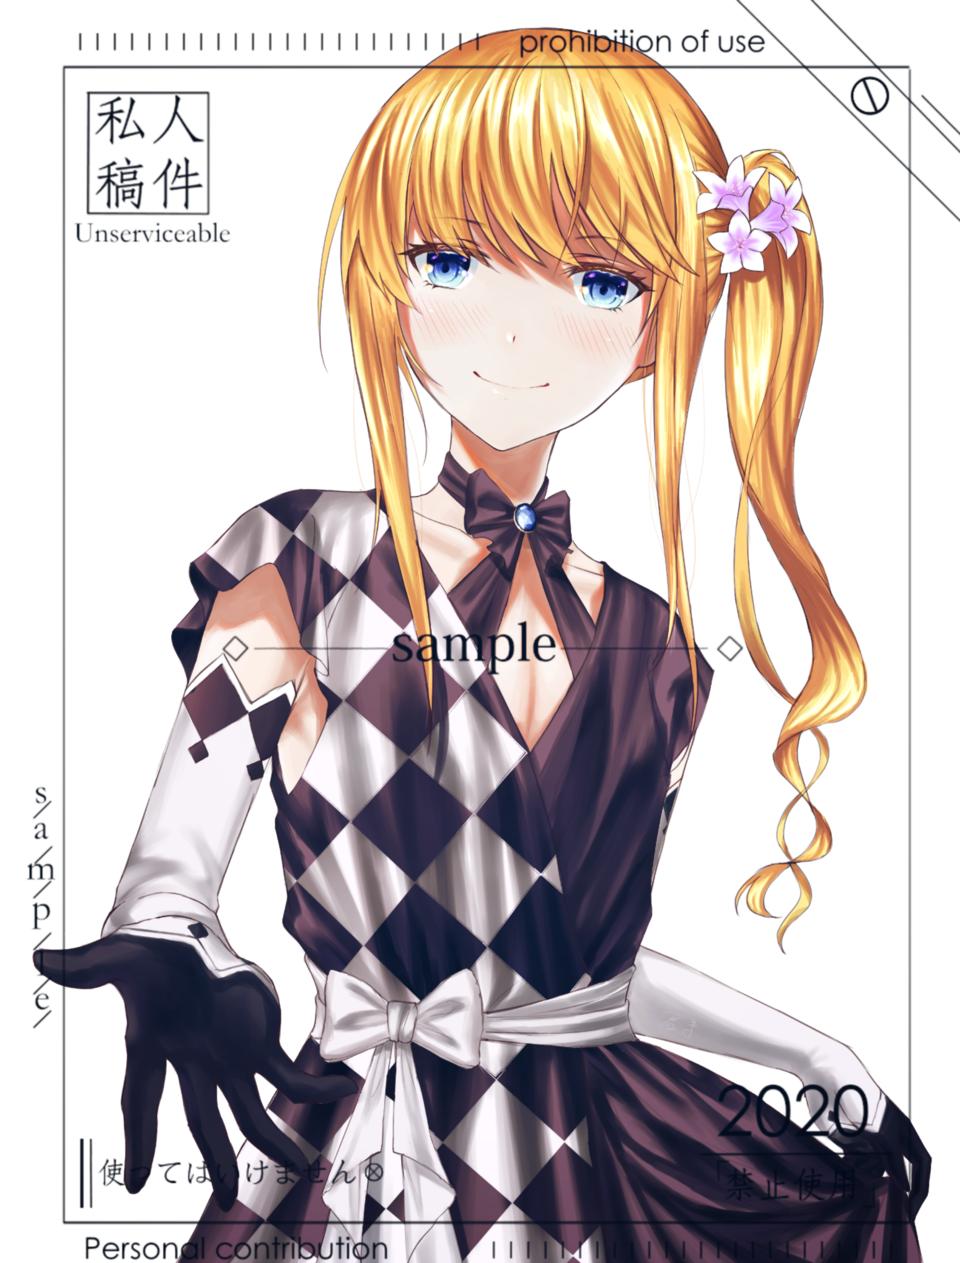 稿子 Illust of 君寻 Fate cute boy